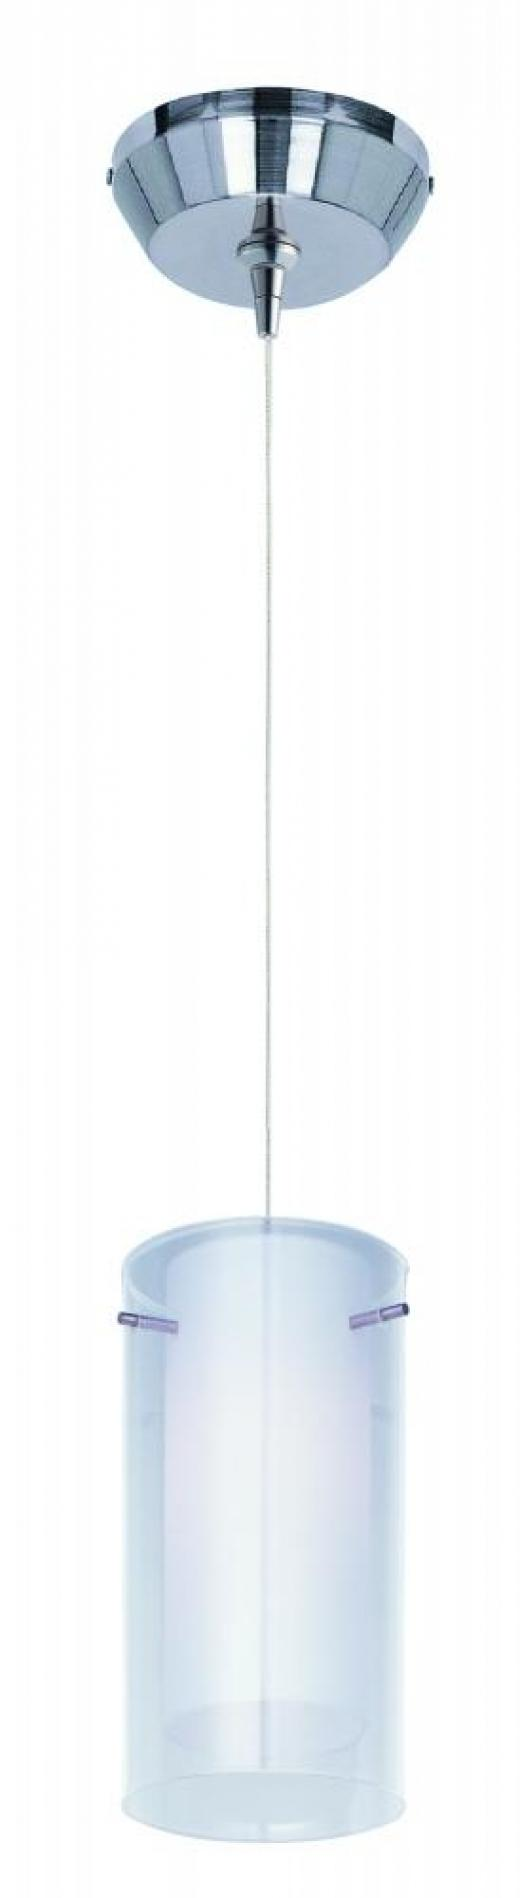 Frost 1-Light RapidJack Pendant and Canopy-E94344-10SN